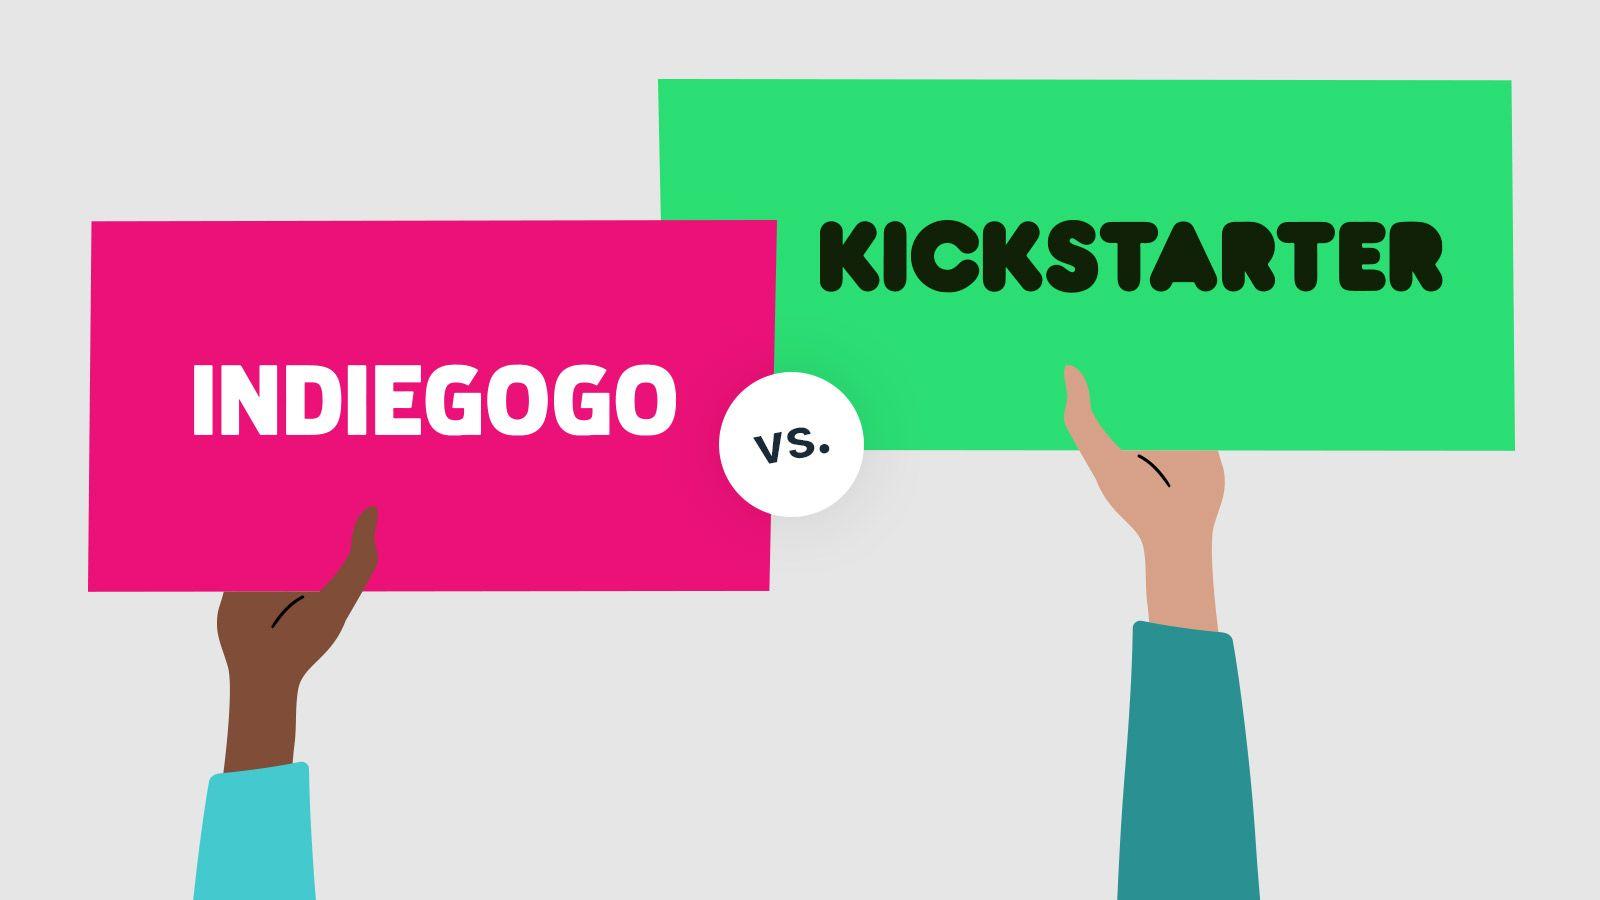 IndieGoGo vs Kickstarter - The Important Differences